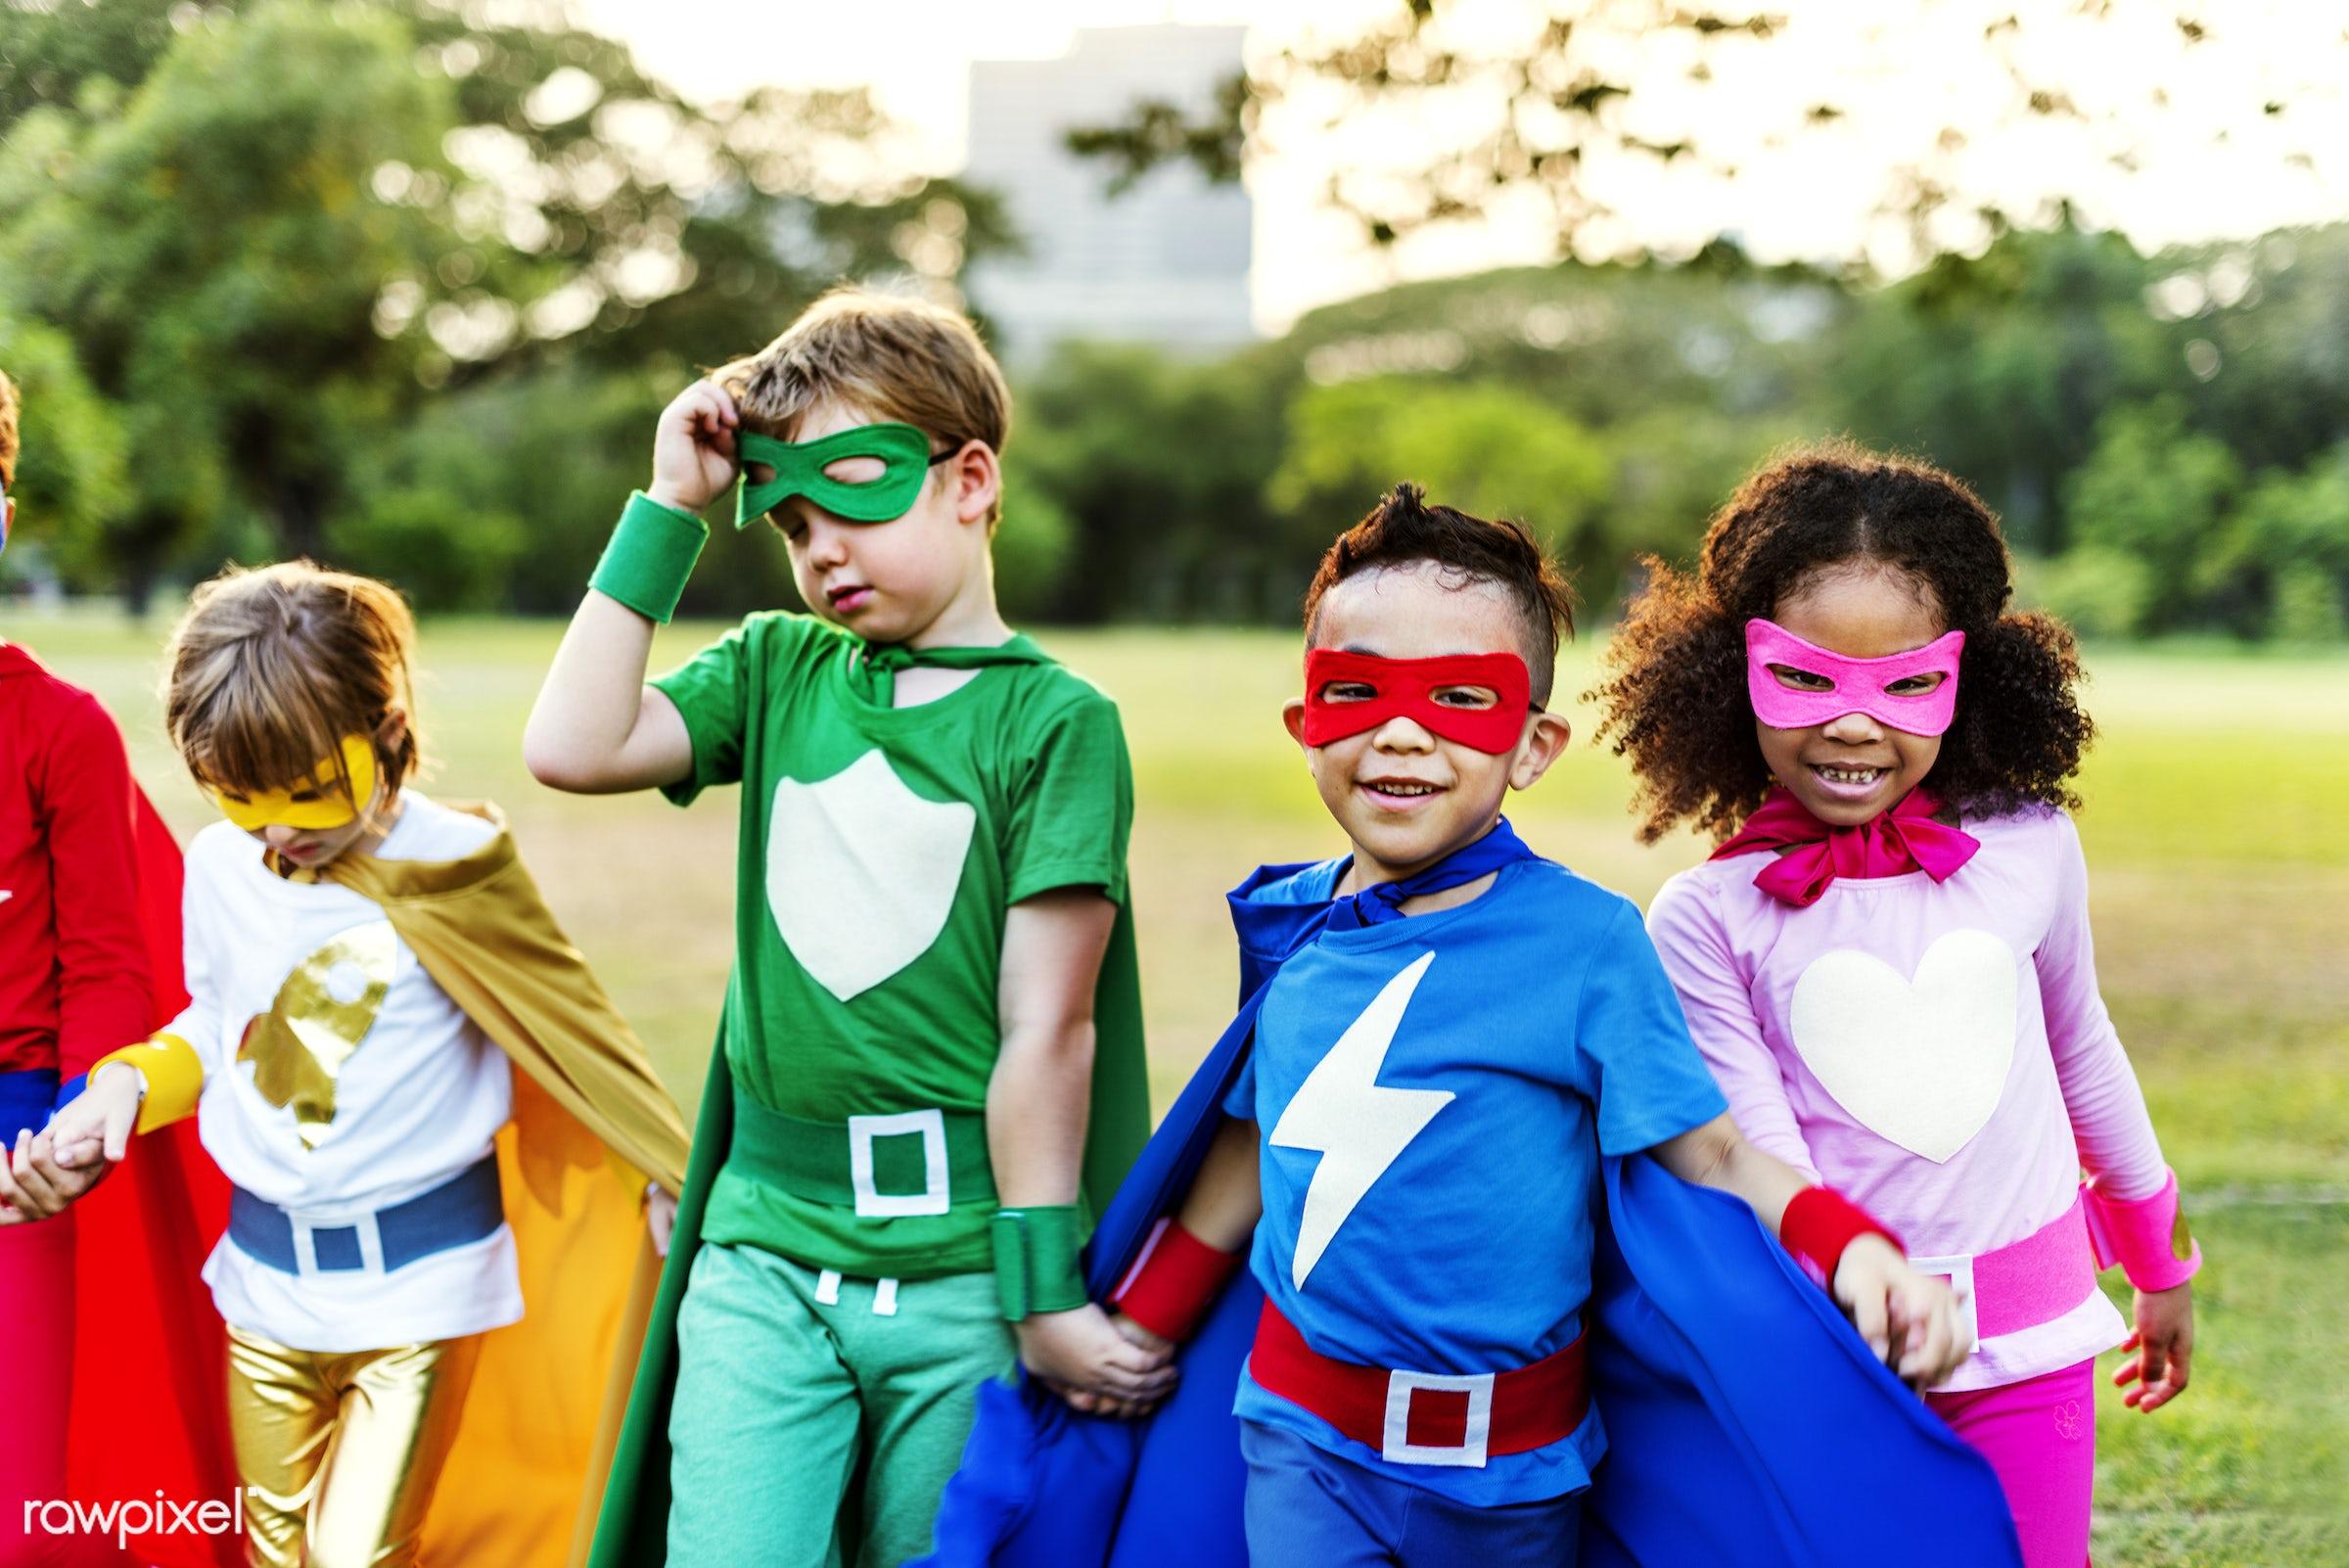 Superhero kids with superpowers - children, diverse, superhero, activity, african descent, asian ethnicity, aspirations,...